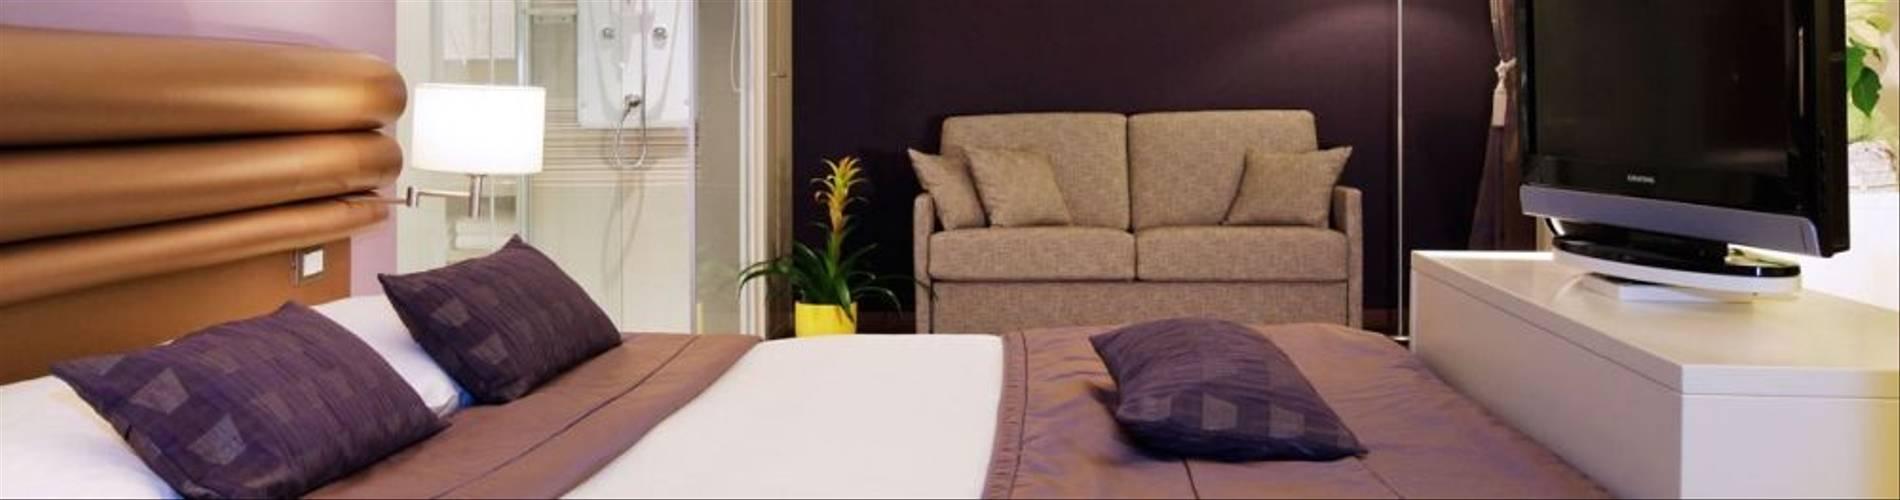 De-Luxe-double-room-Korkyra.jpg